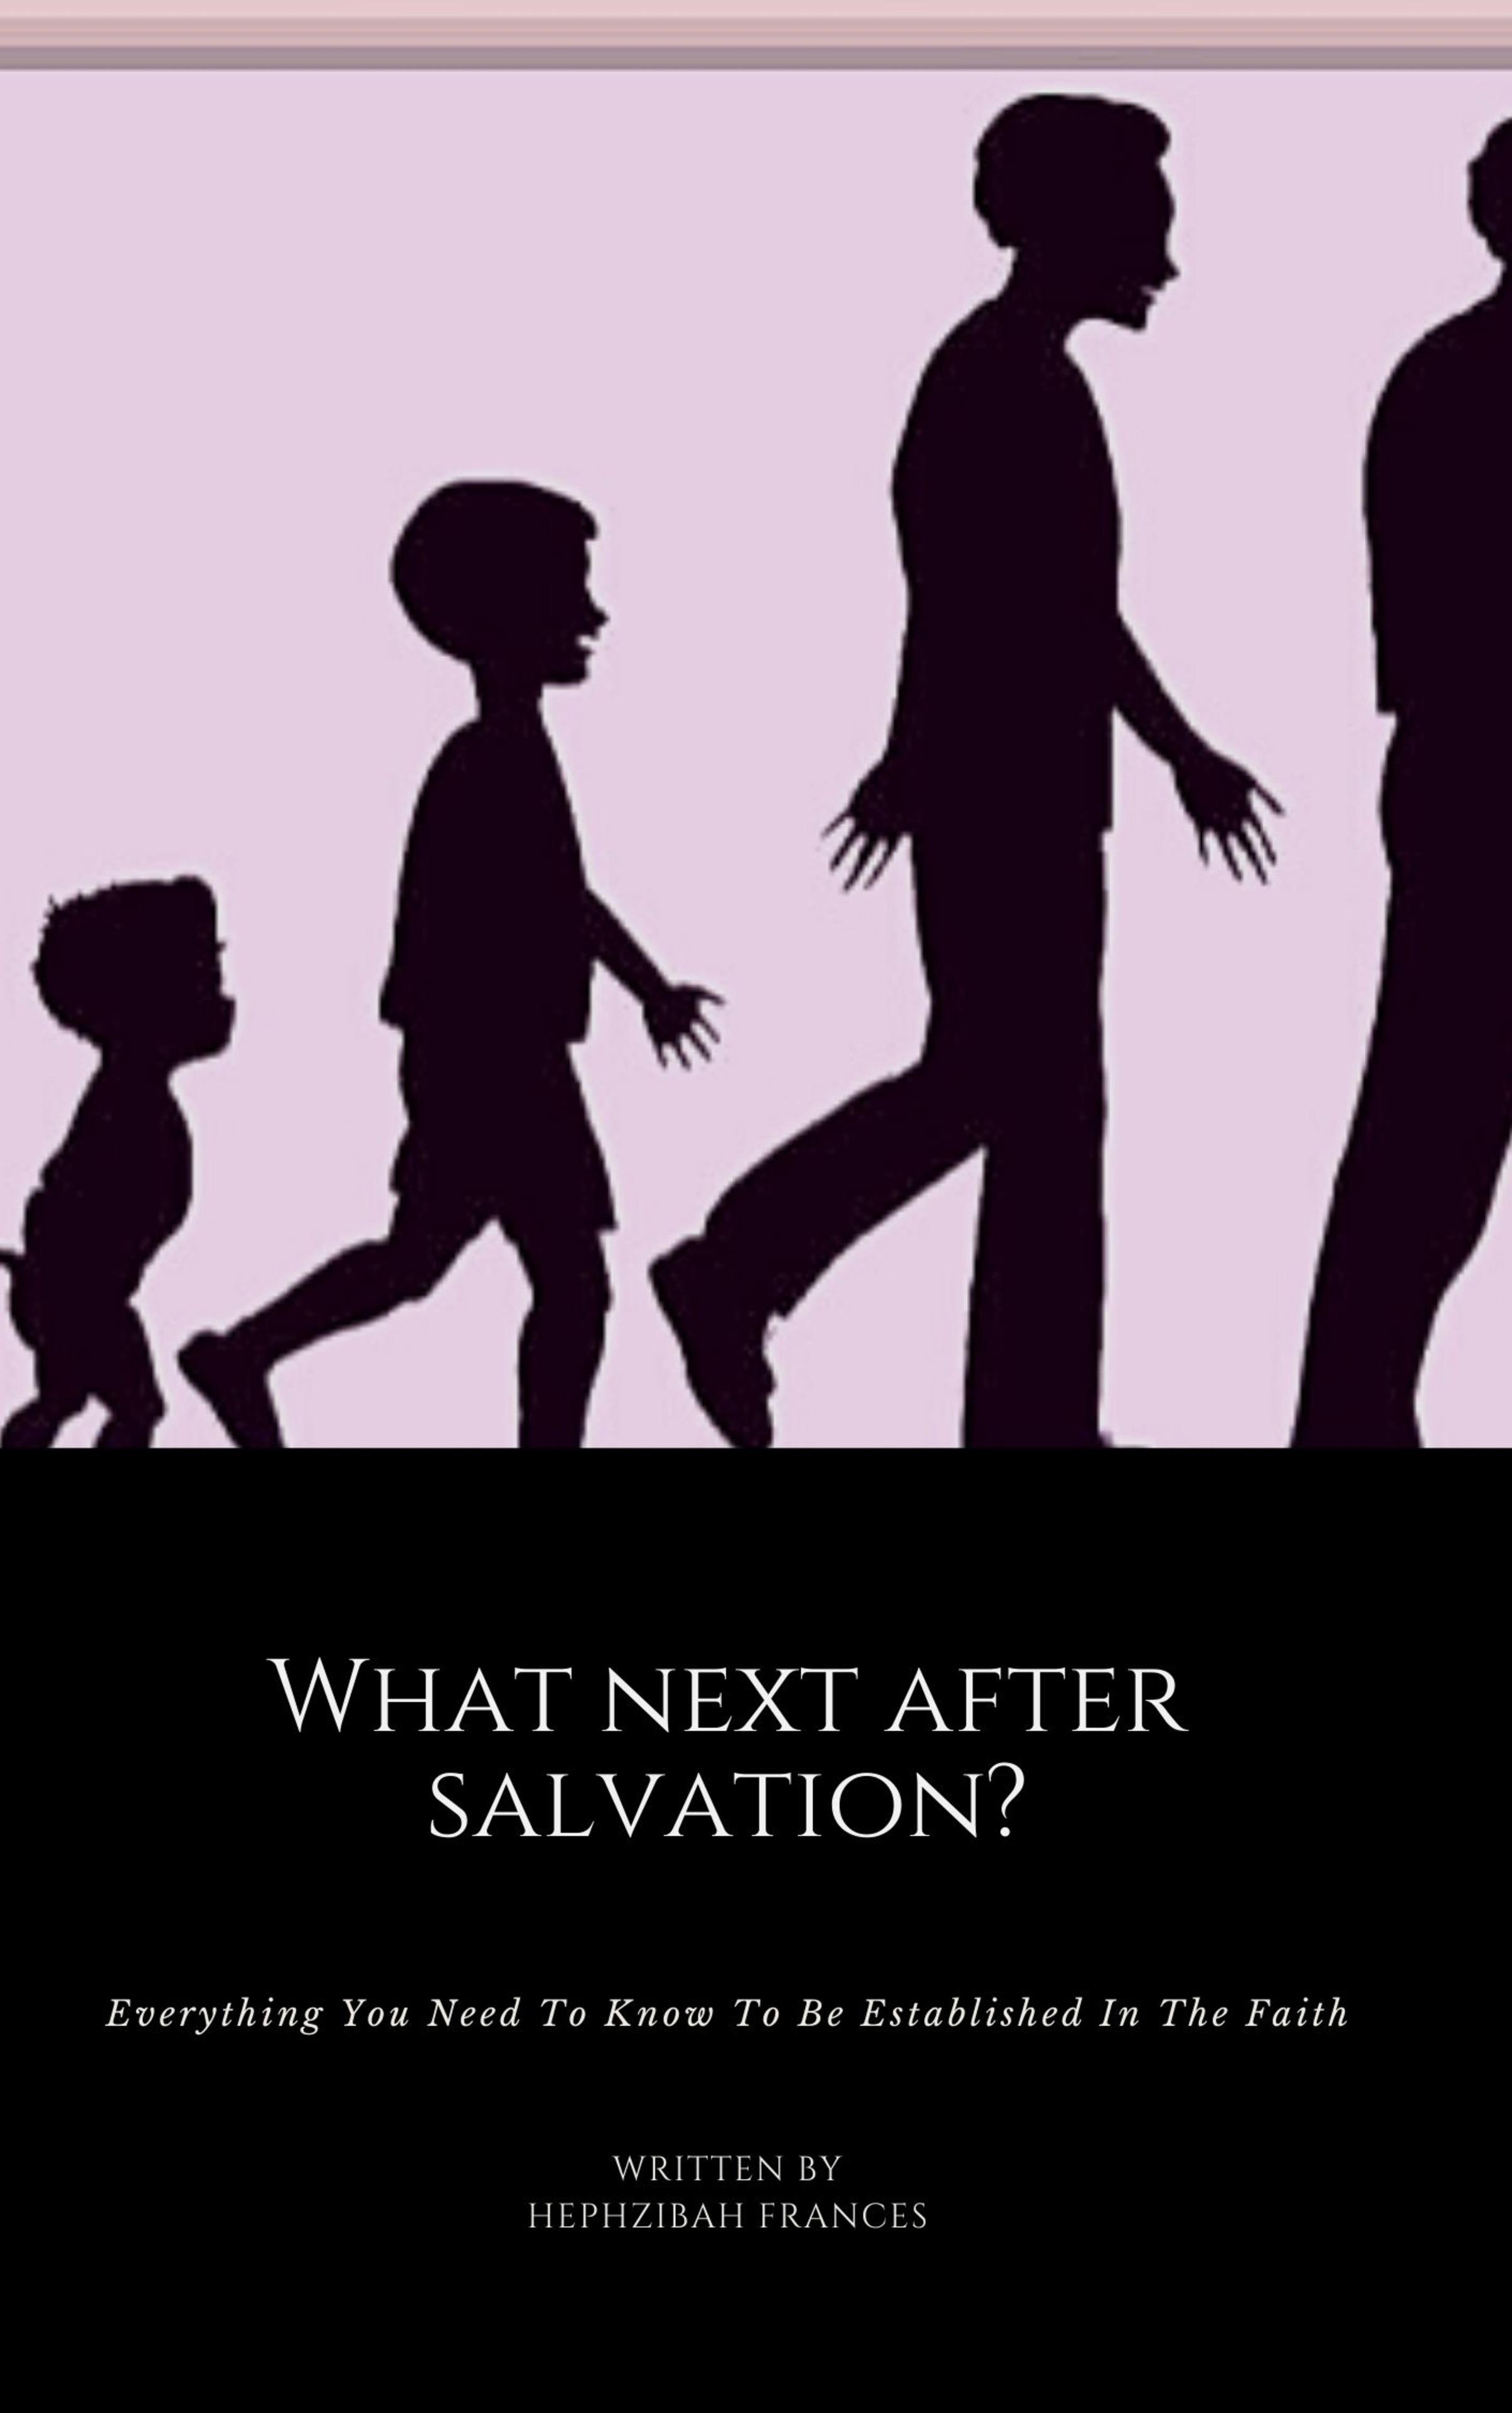 What Next After Salvation?